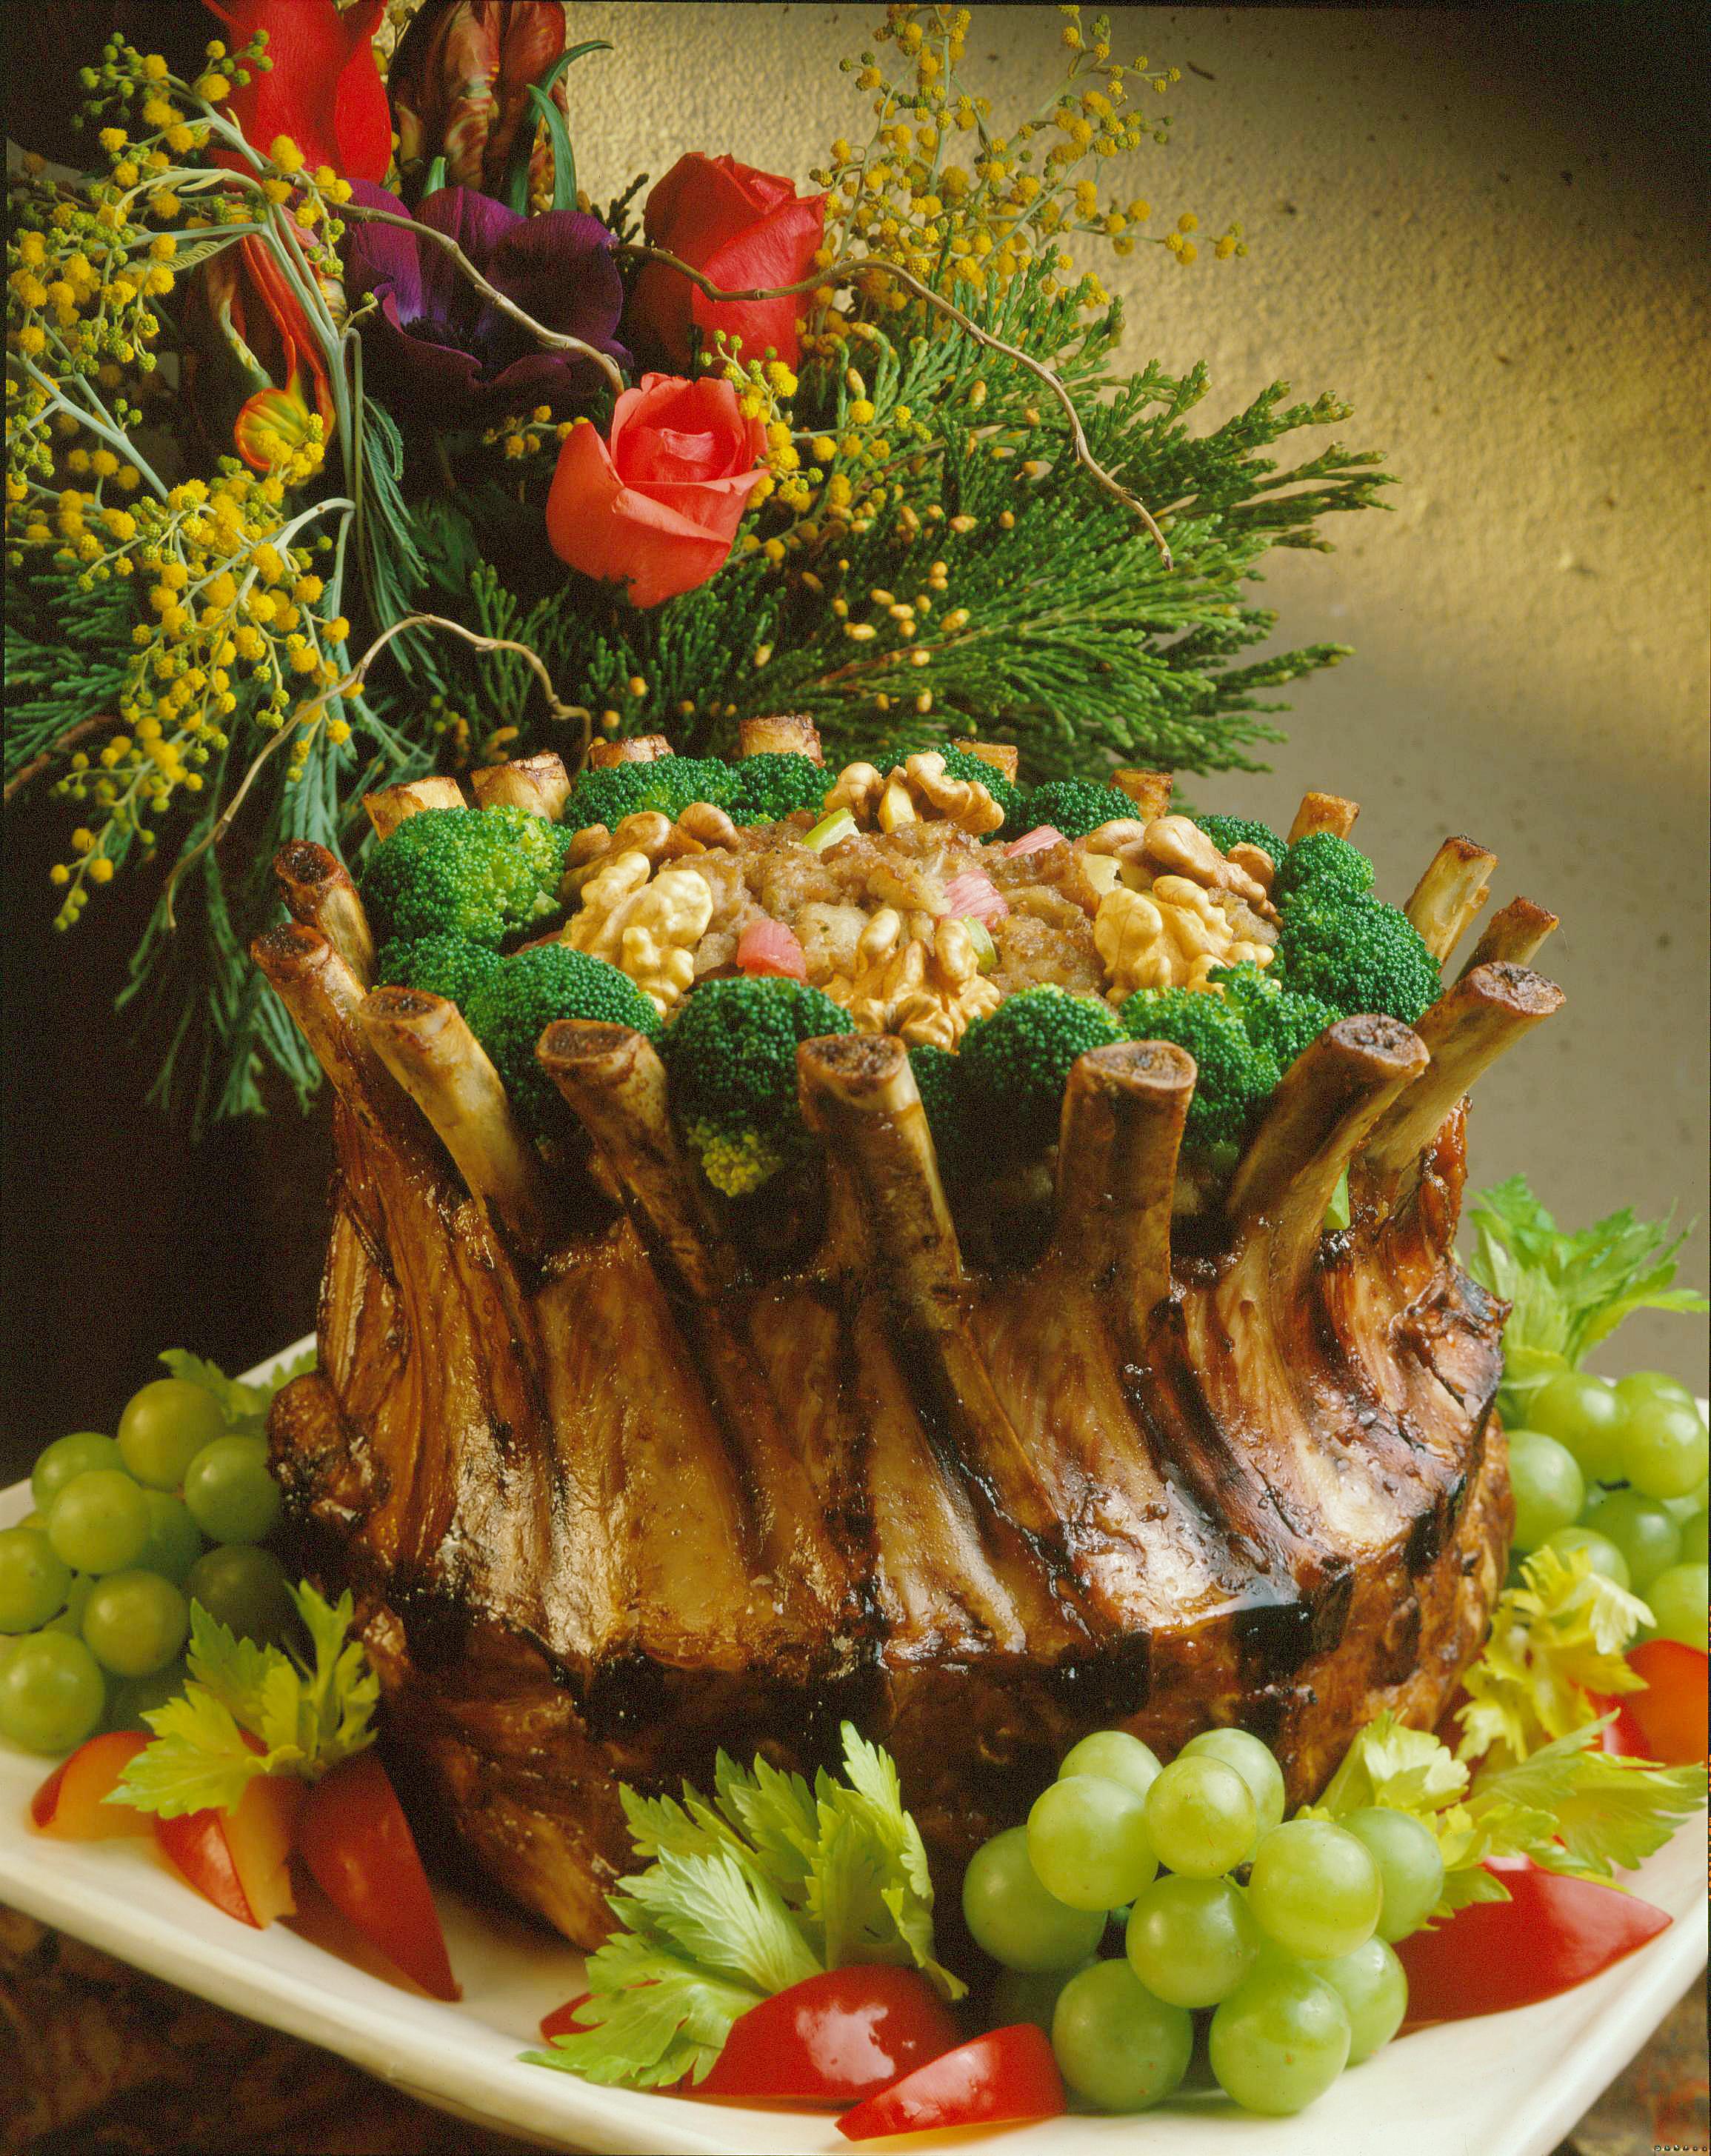 Crown pork stuffing recipes